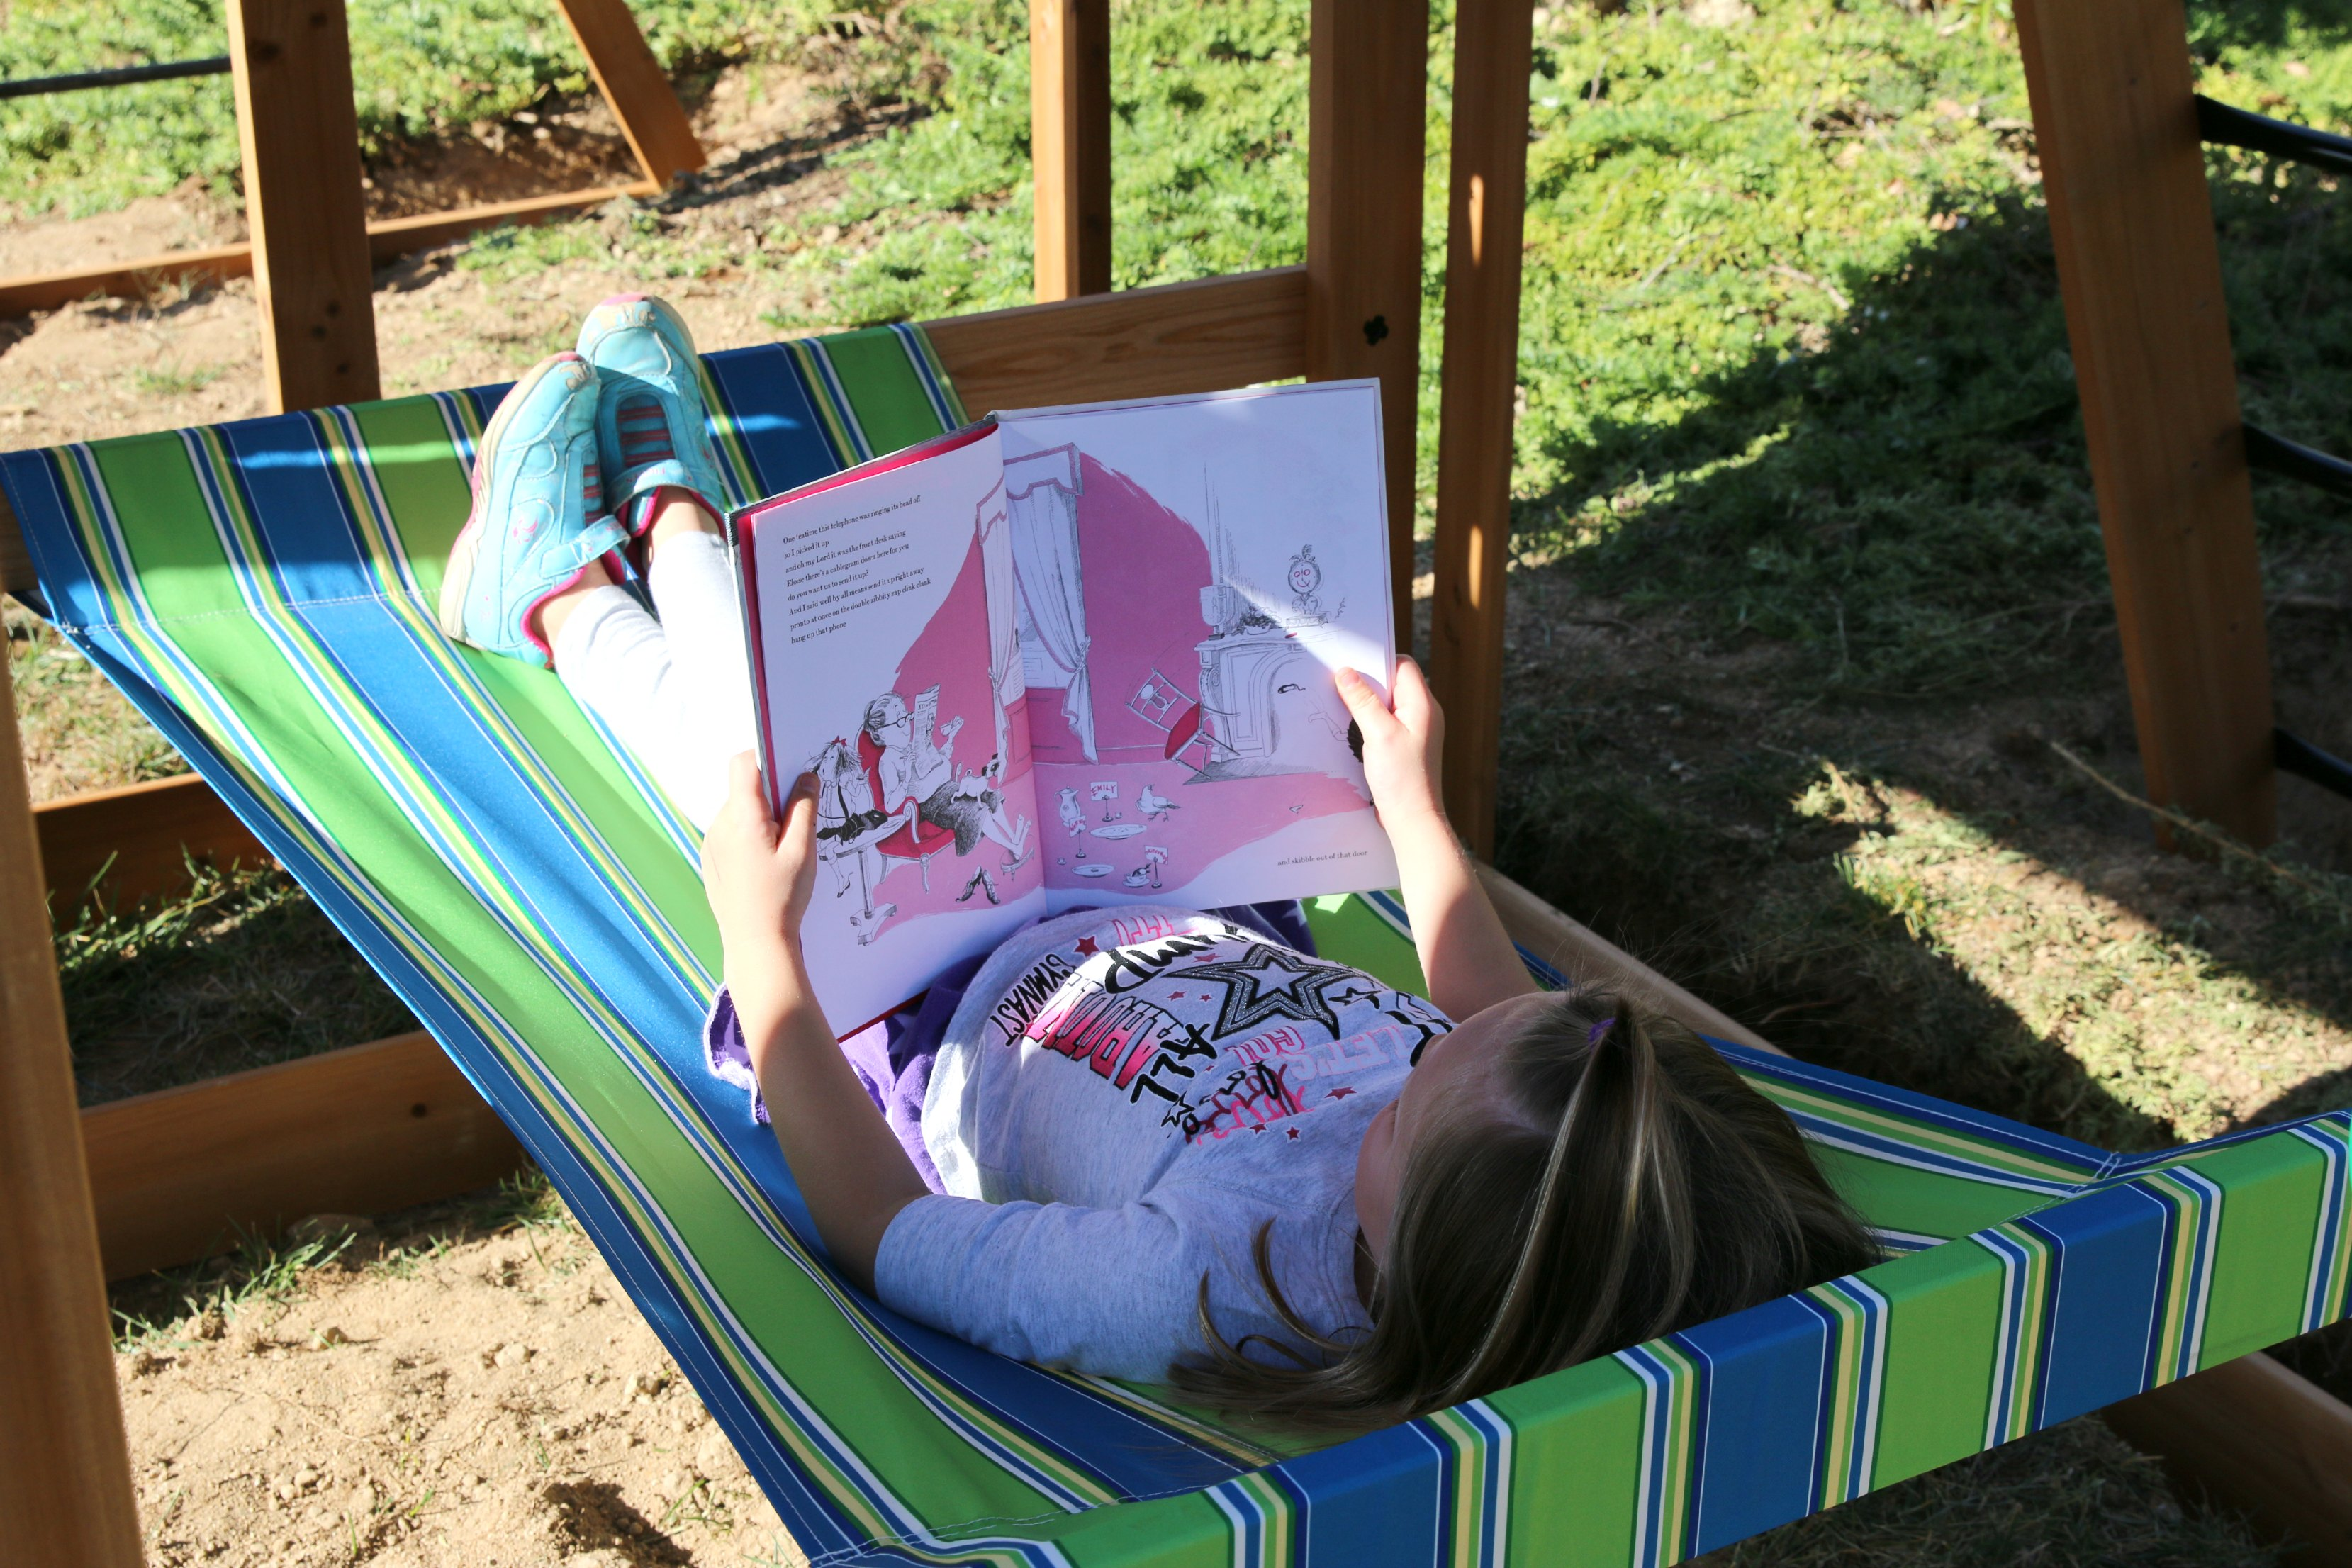 relaxing outdoor fun for kids